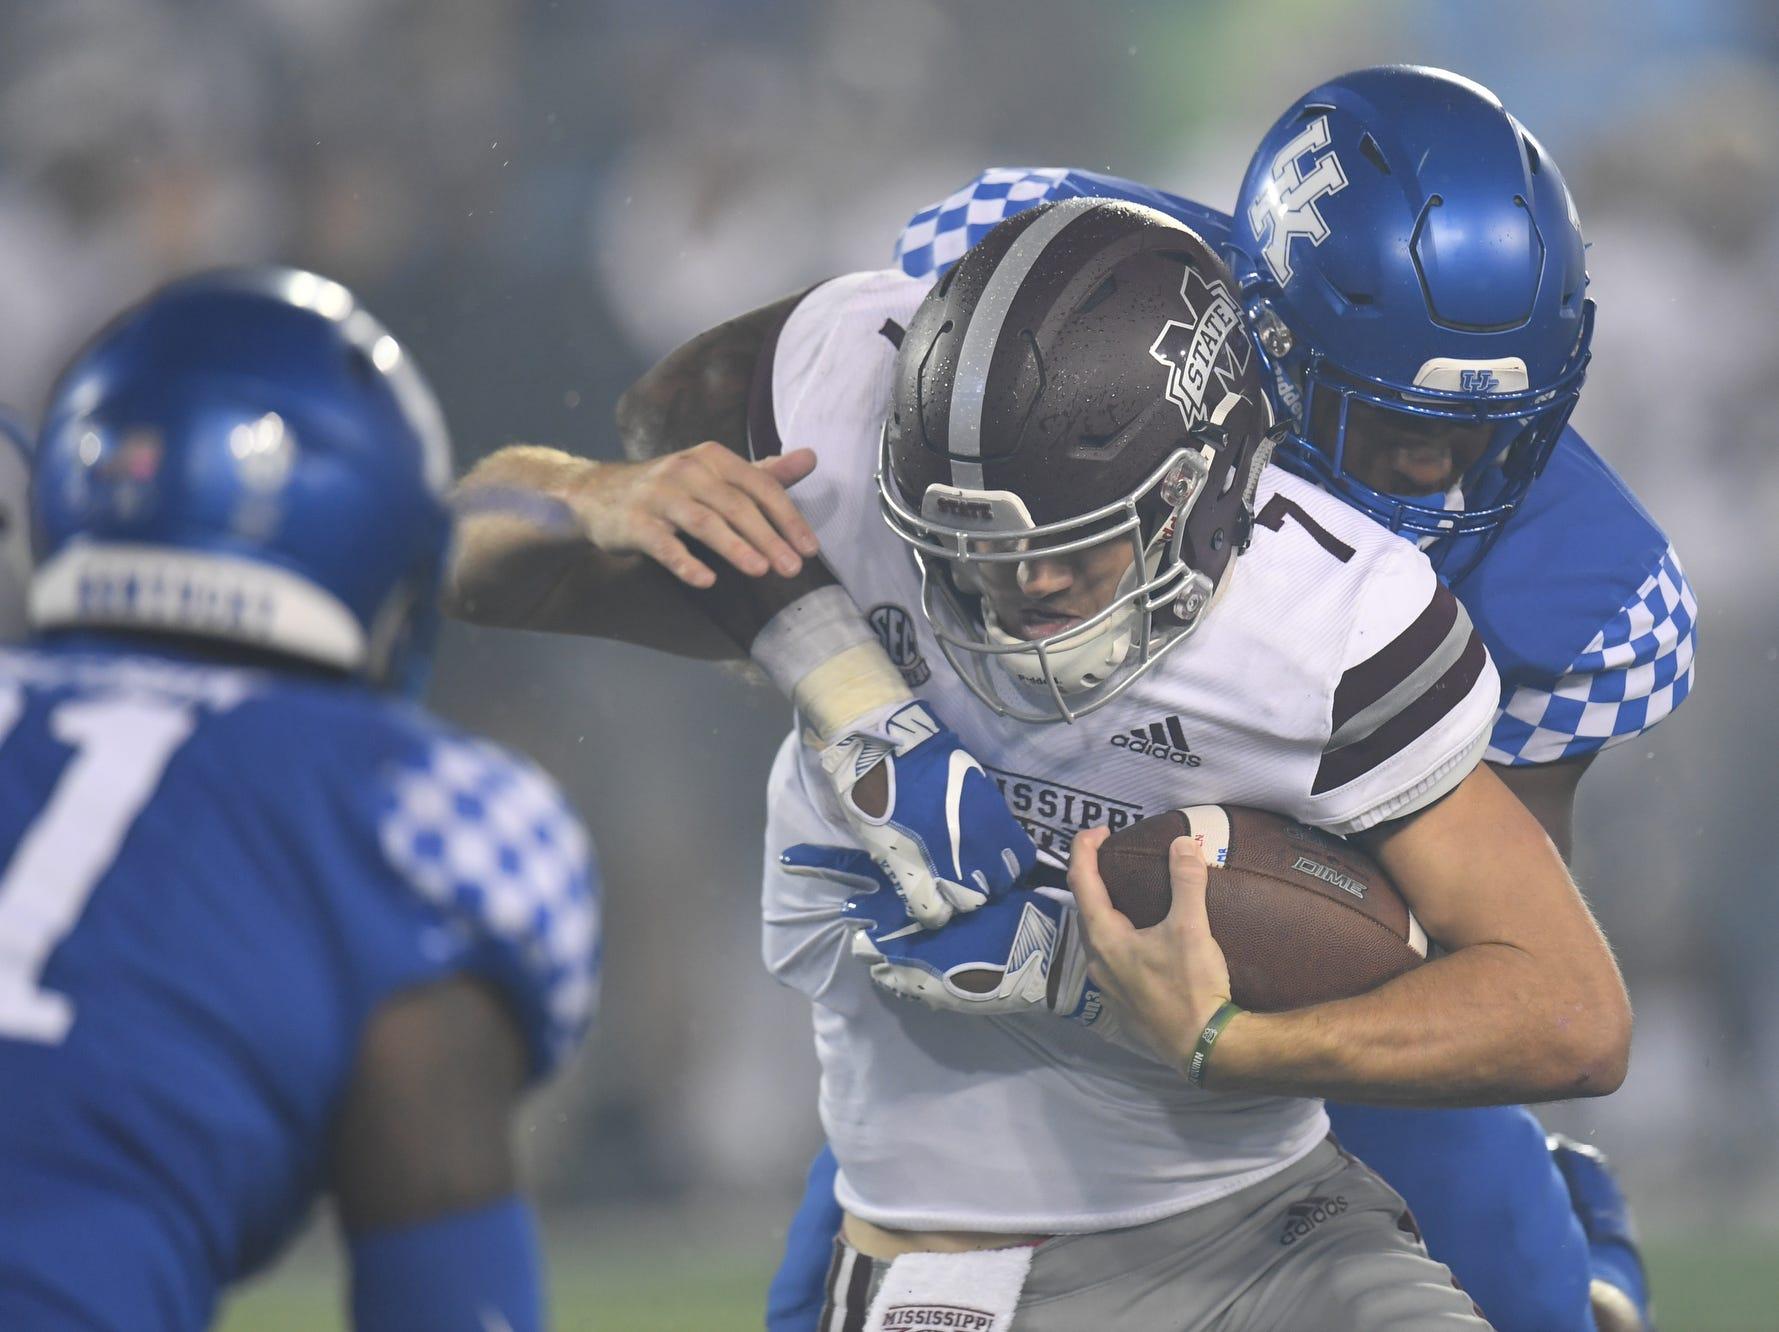 UK DE Josh Allen sacks Mississippi State QB Nick Fitzgerald during the University of Kentucky football game against Mississippi State at Kroger Field in Lexington, Kentucky on Saturday, September 22, 2018.